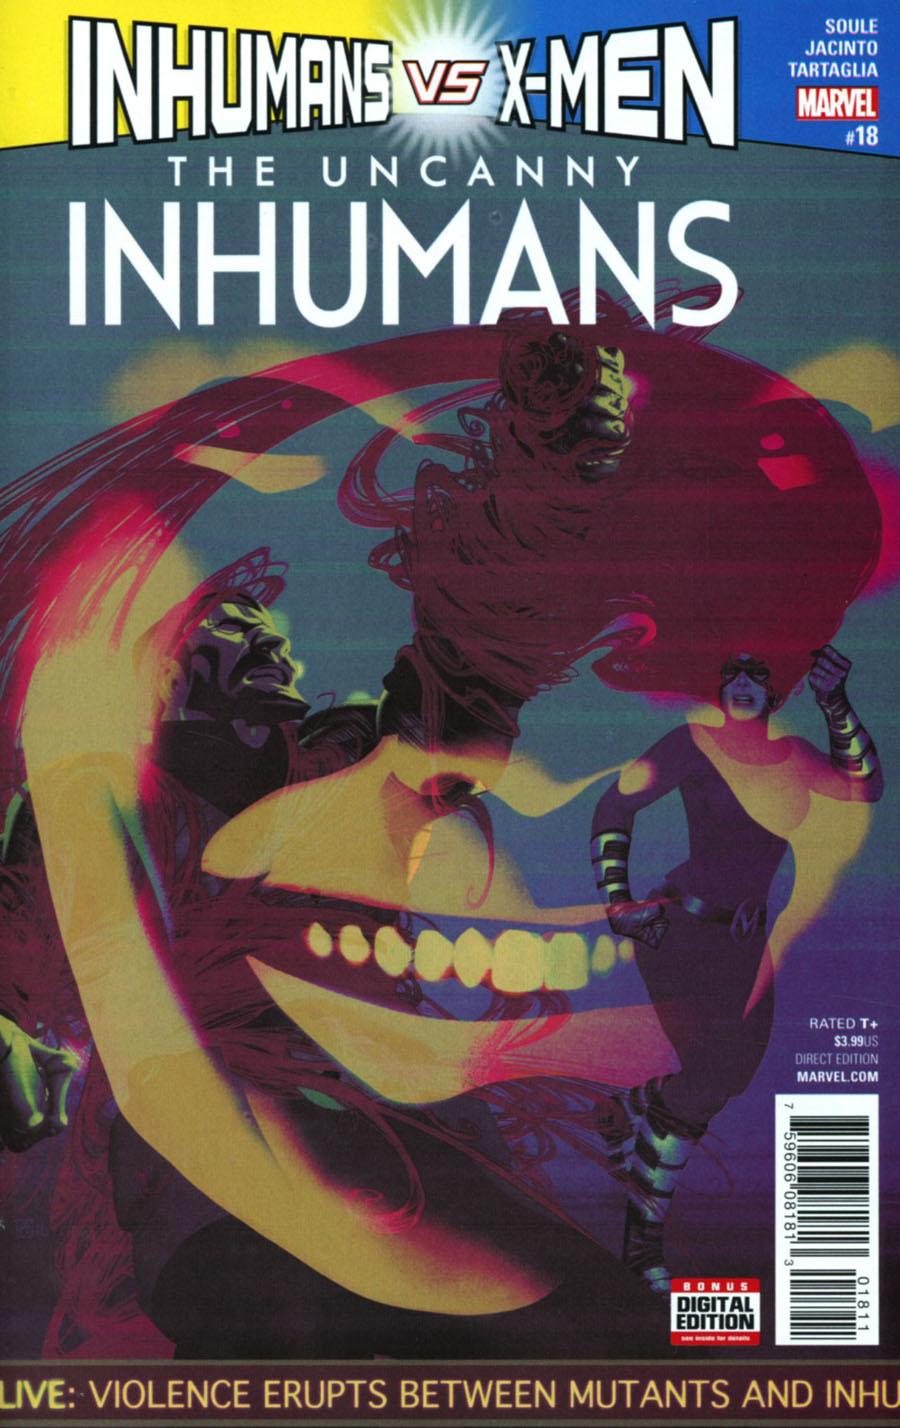 Uncanny Inhumans #18 Cover A Regular Frazer Irving Cover (Inhumans vs X-Men Tie-In)